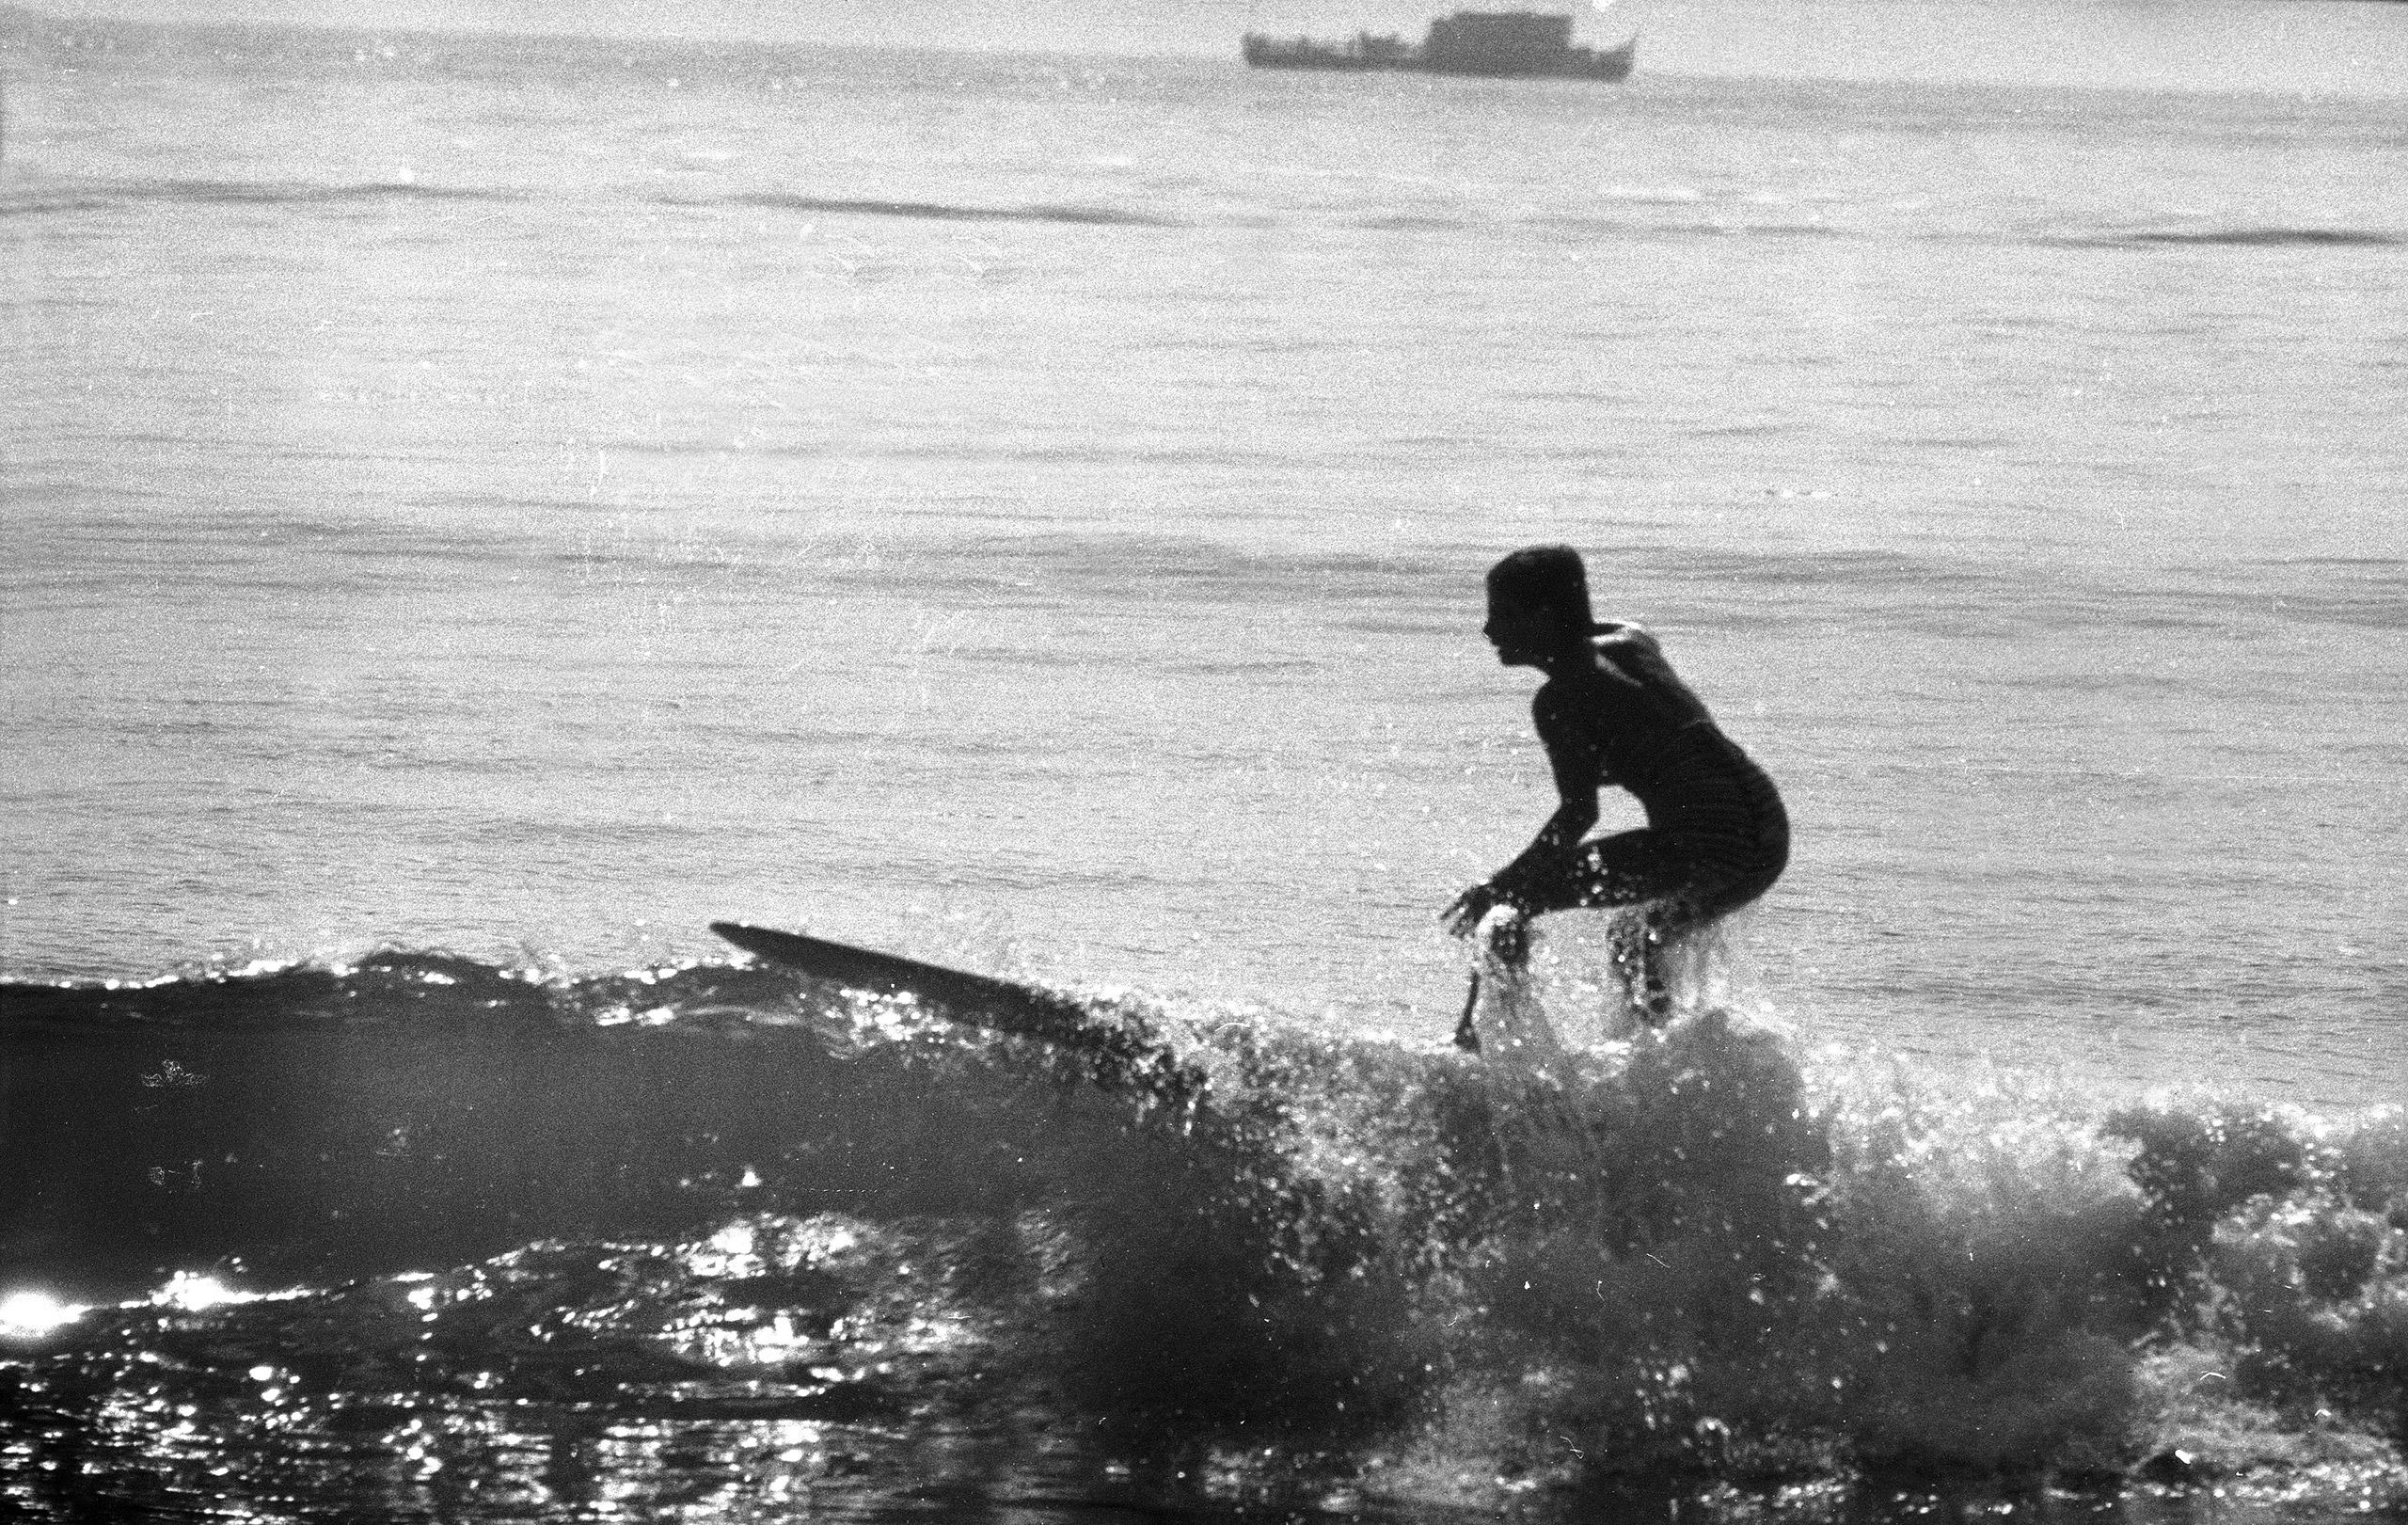 Kathy Kohner (aka Gidget) surfing, 1957.